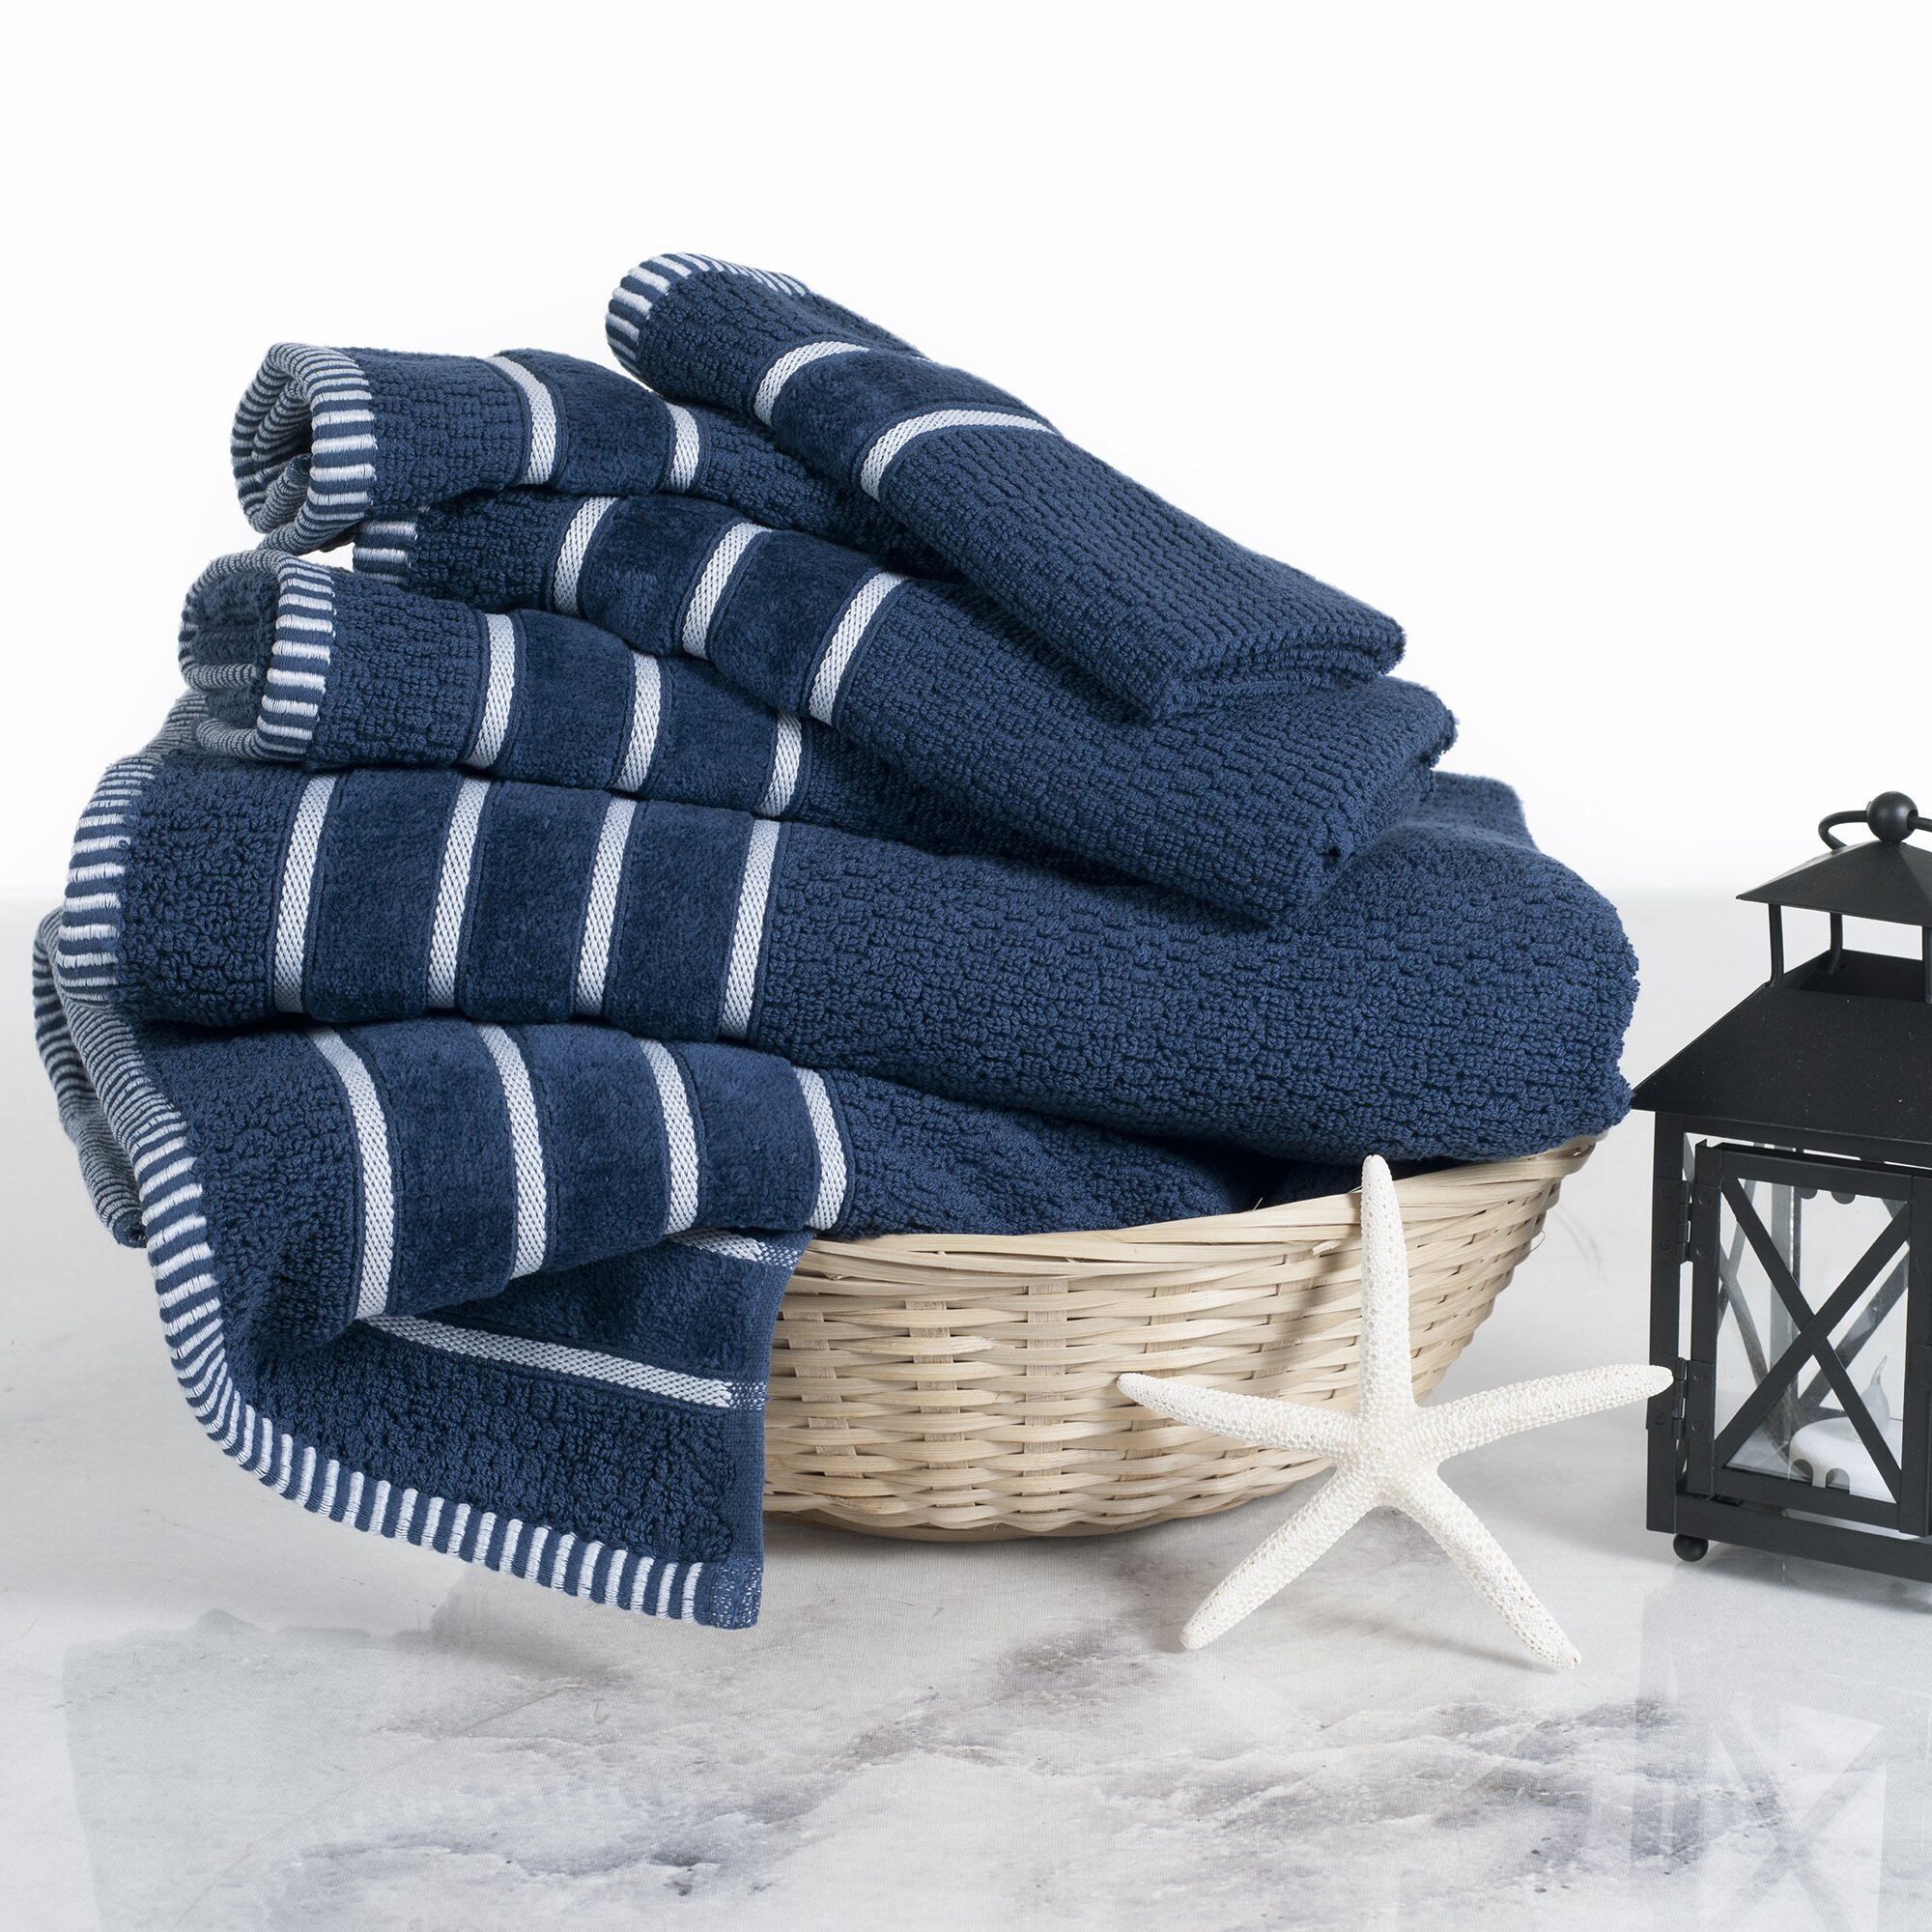 Decorative Hand Towels For Powder Room Brayden Studio Delfino Rice Weave 6 Piece Towel Set Reviews